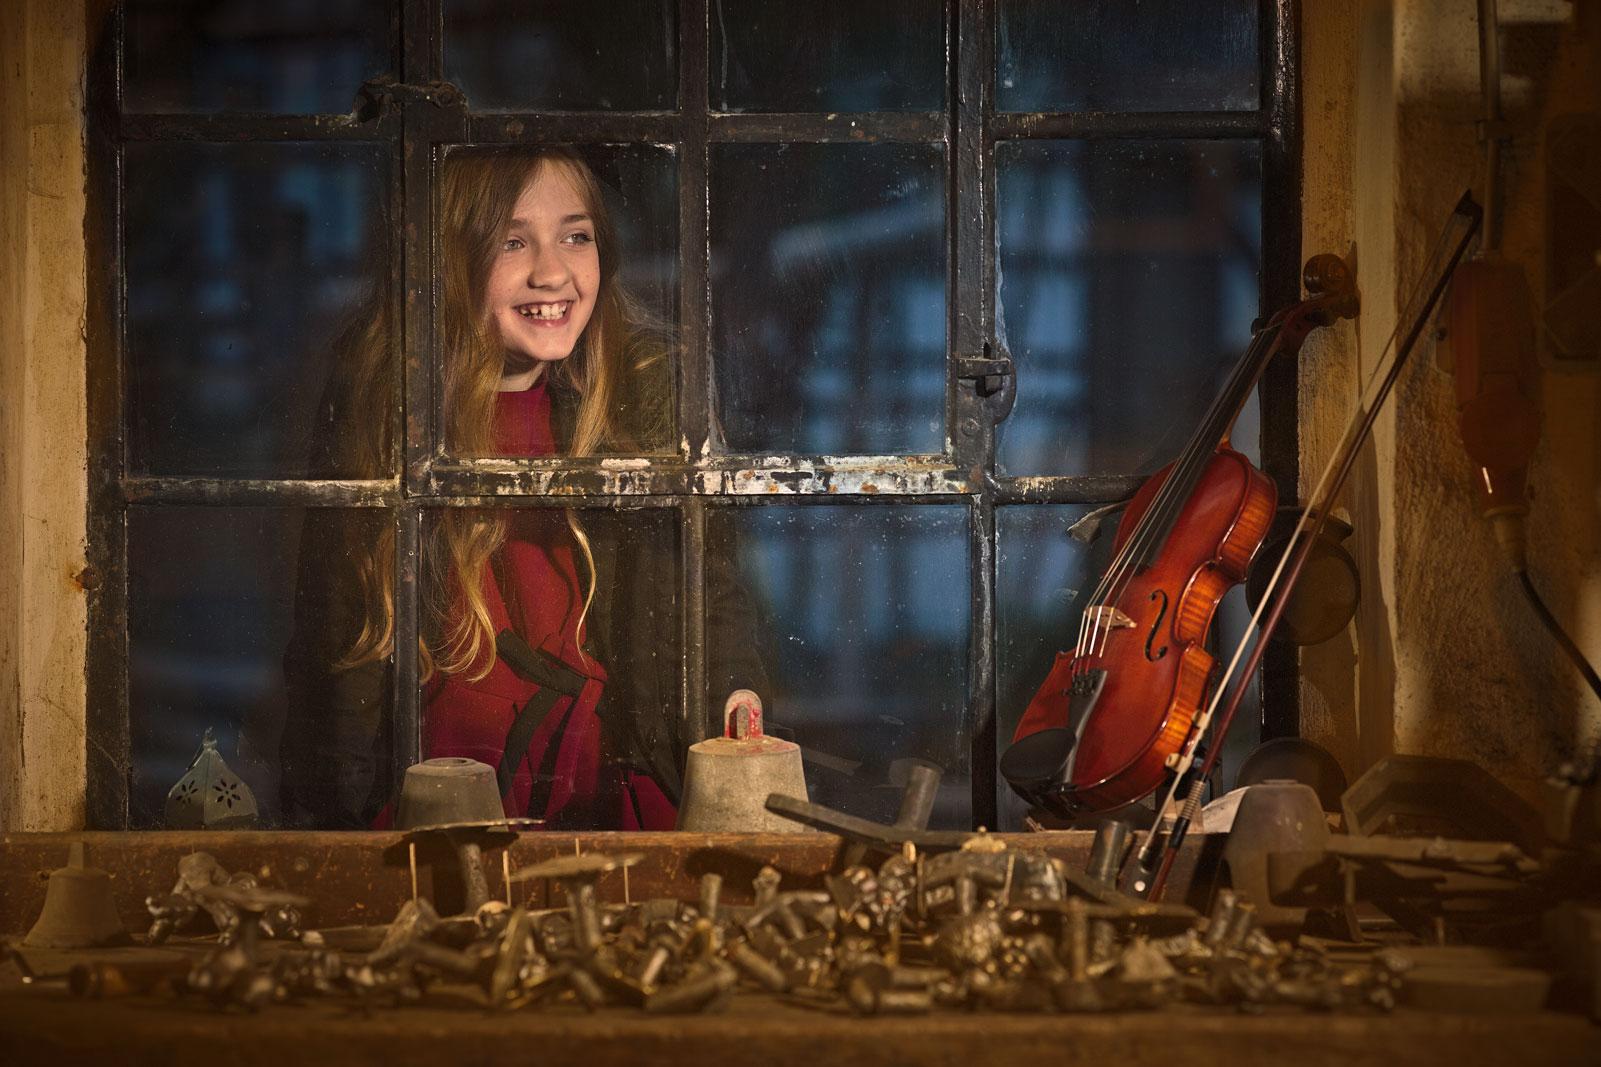 Geige Hand Konstruktion Malen Farbe Geigenbau, Metallbau